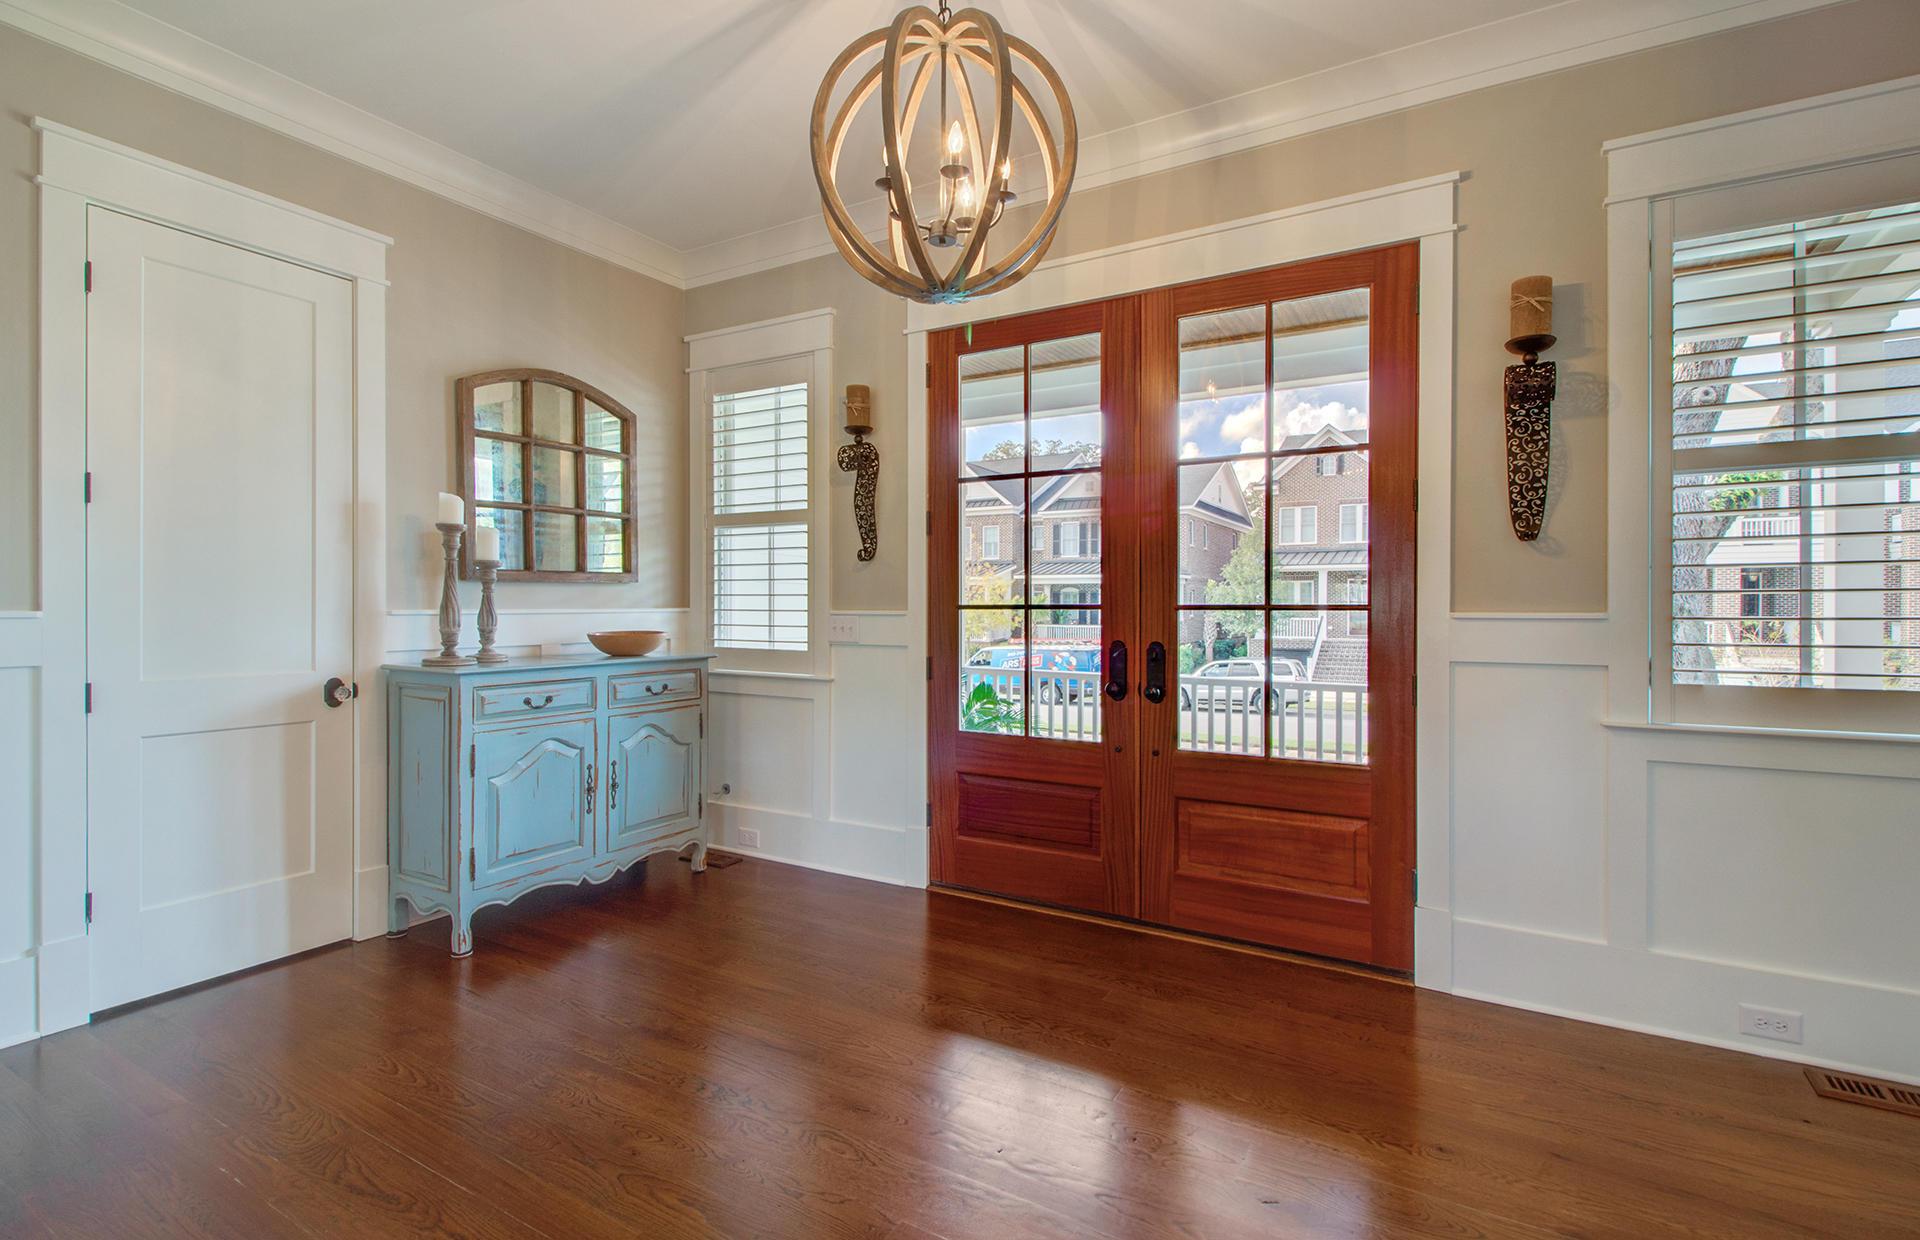 Daniel Island Park Homes For Sale - 117 Brailsford, Charleston, SC - 6